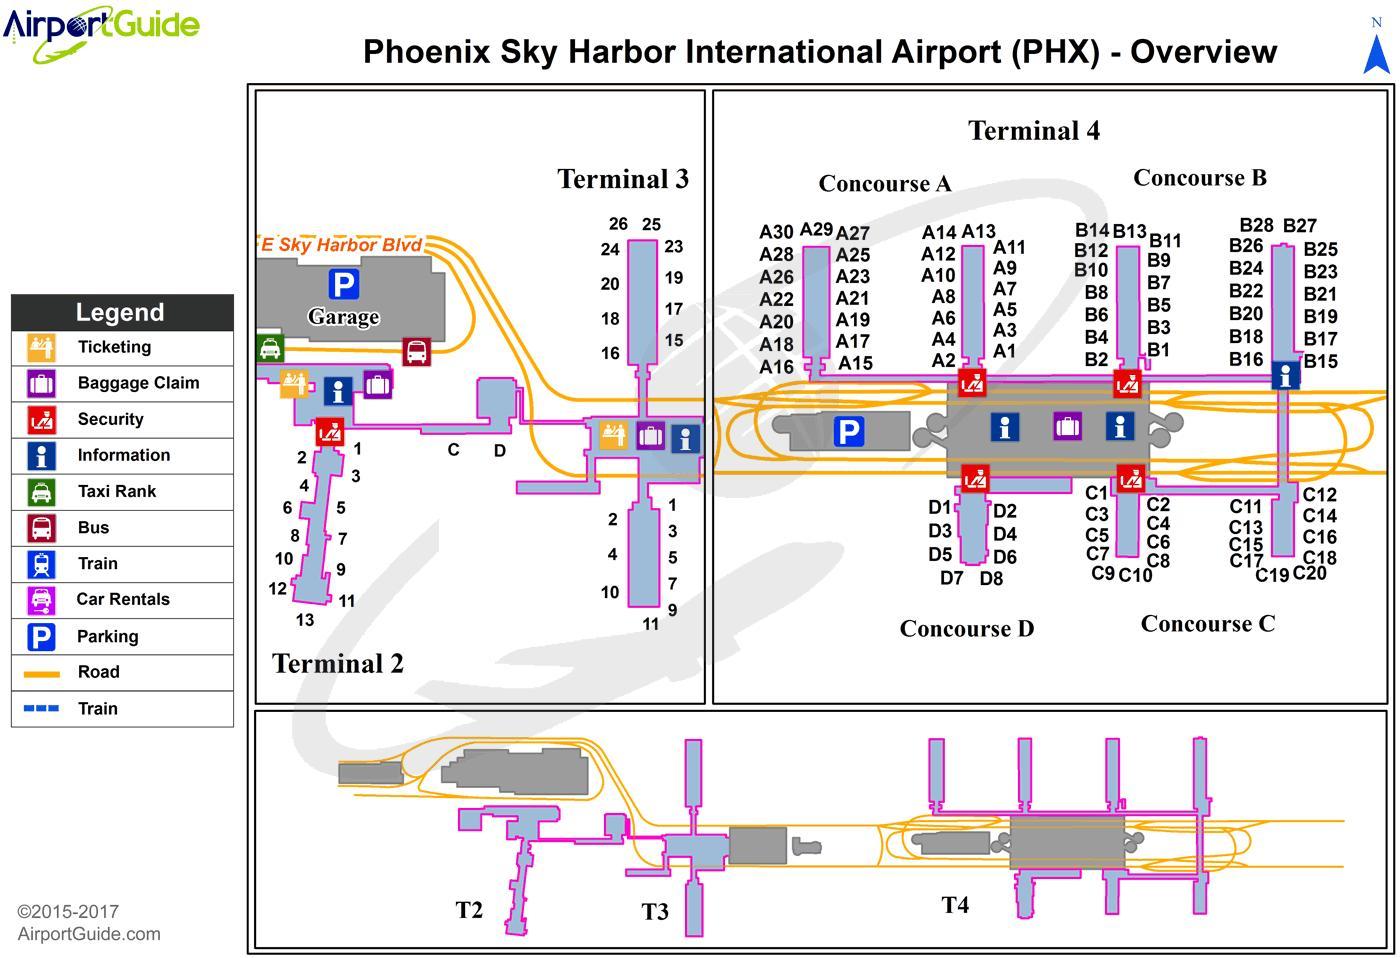 Sky Harbor Airport Map Phoenix sky harbor airport map   Map of Phoenix sky harbor airport  Sky Harbor Airport Map